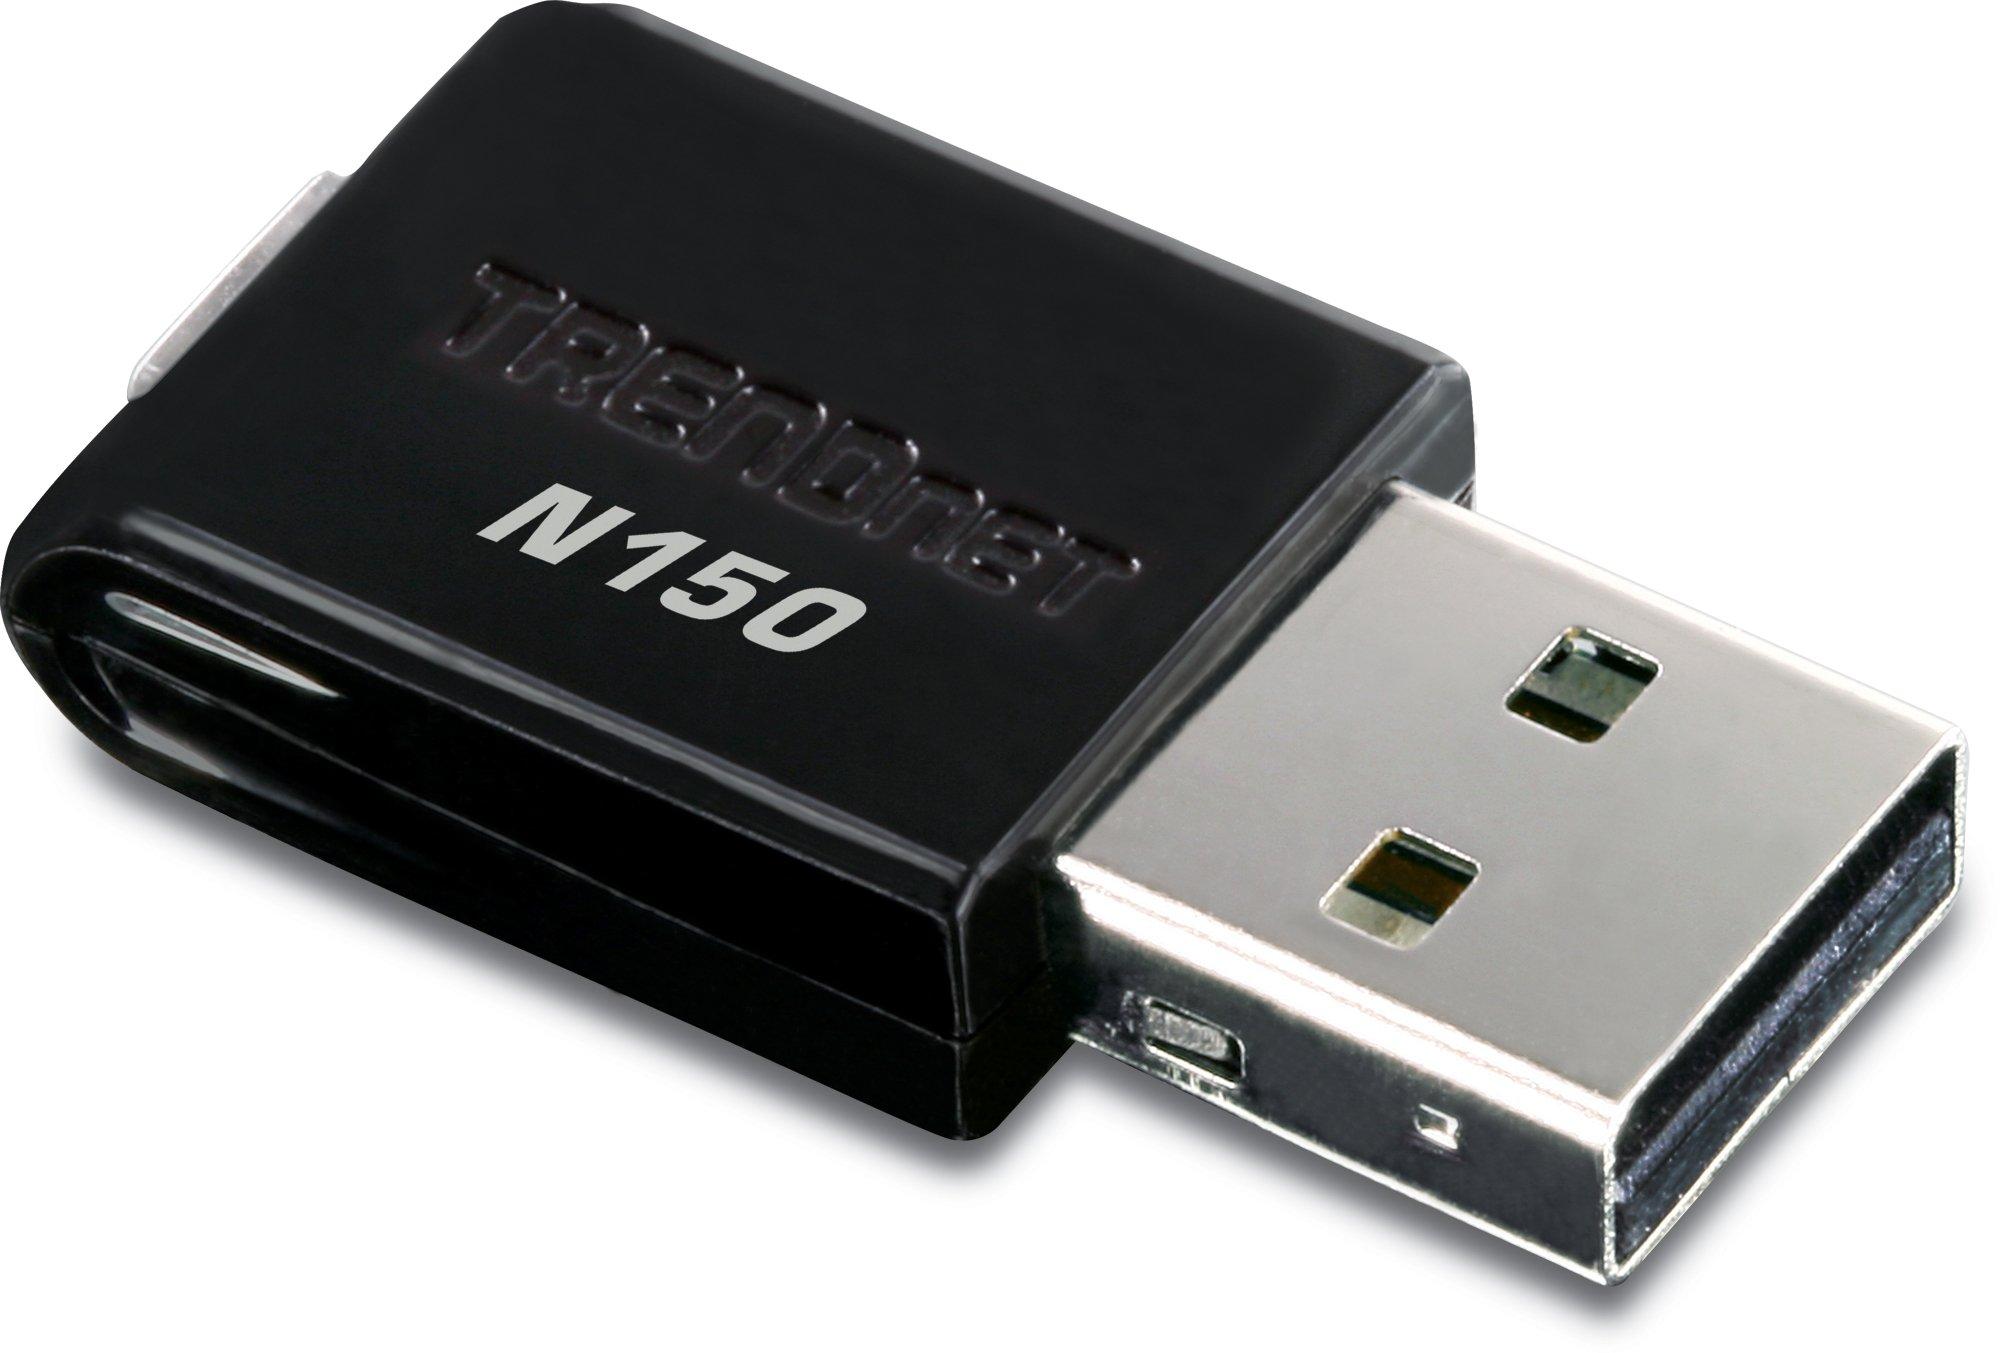 TRENDnet - Micro Adaptateur USB sans Fil N150, TEW-648UBM product image